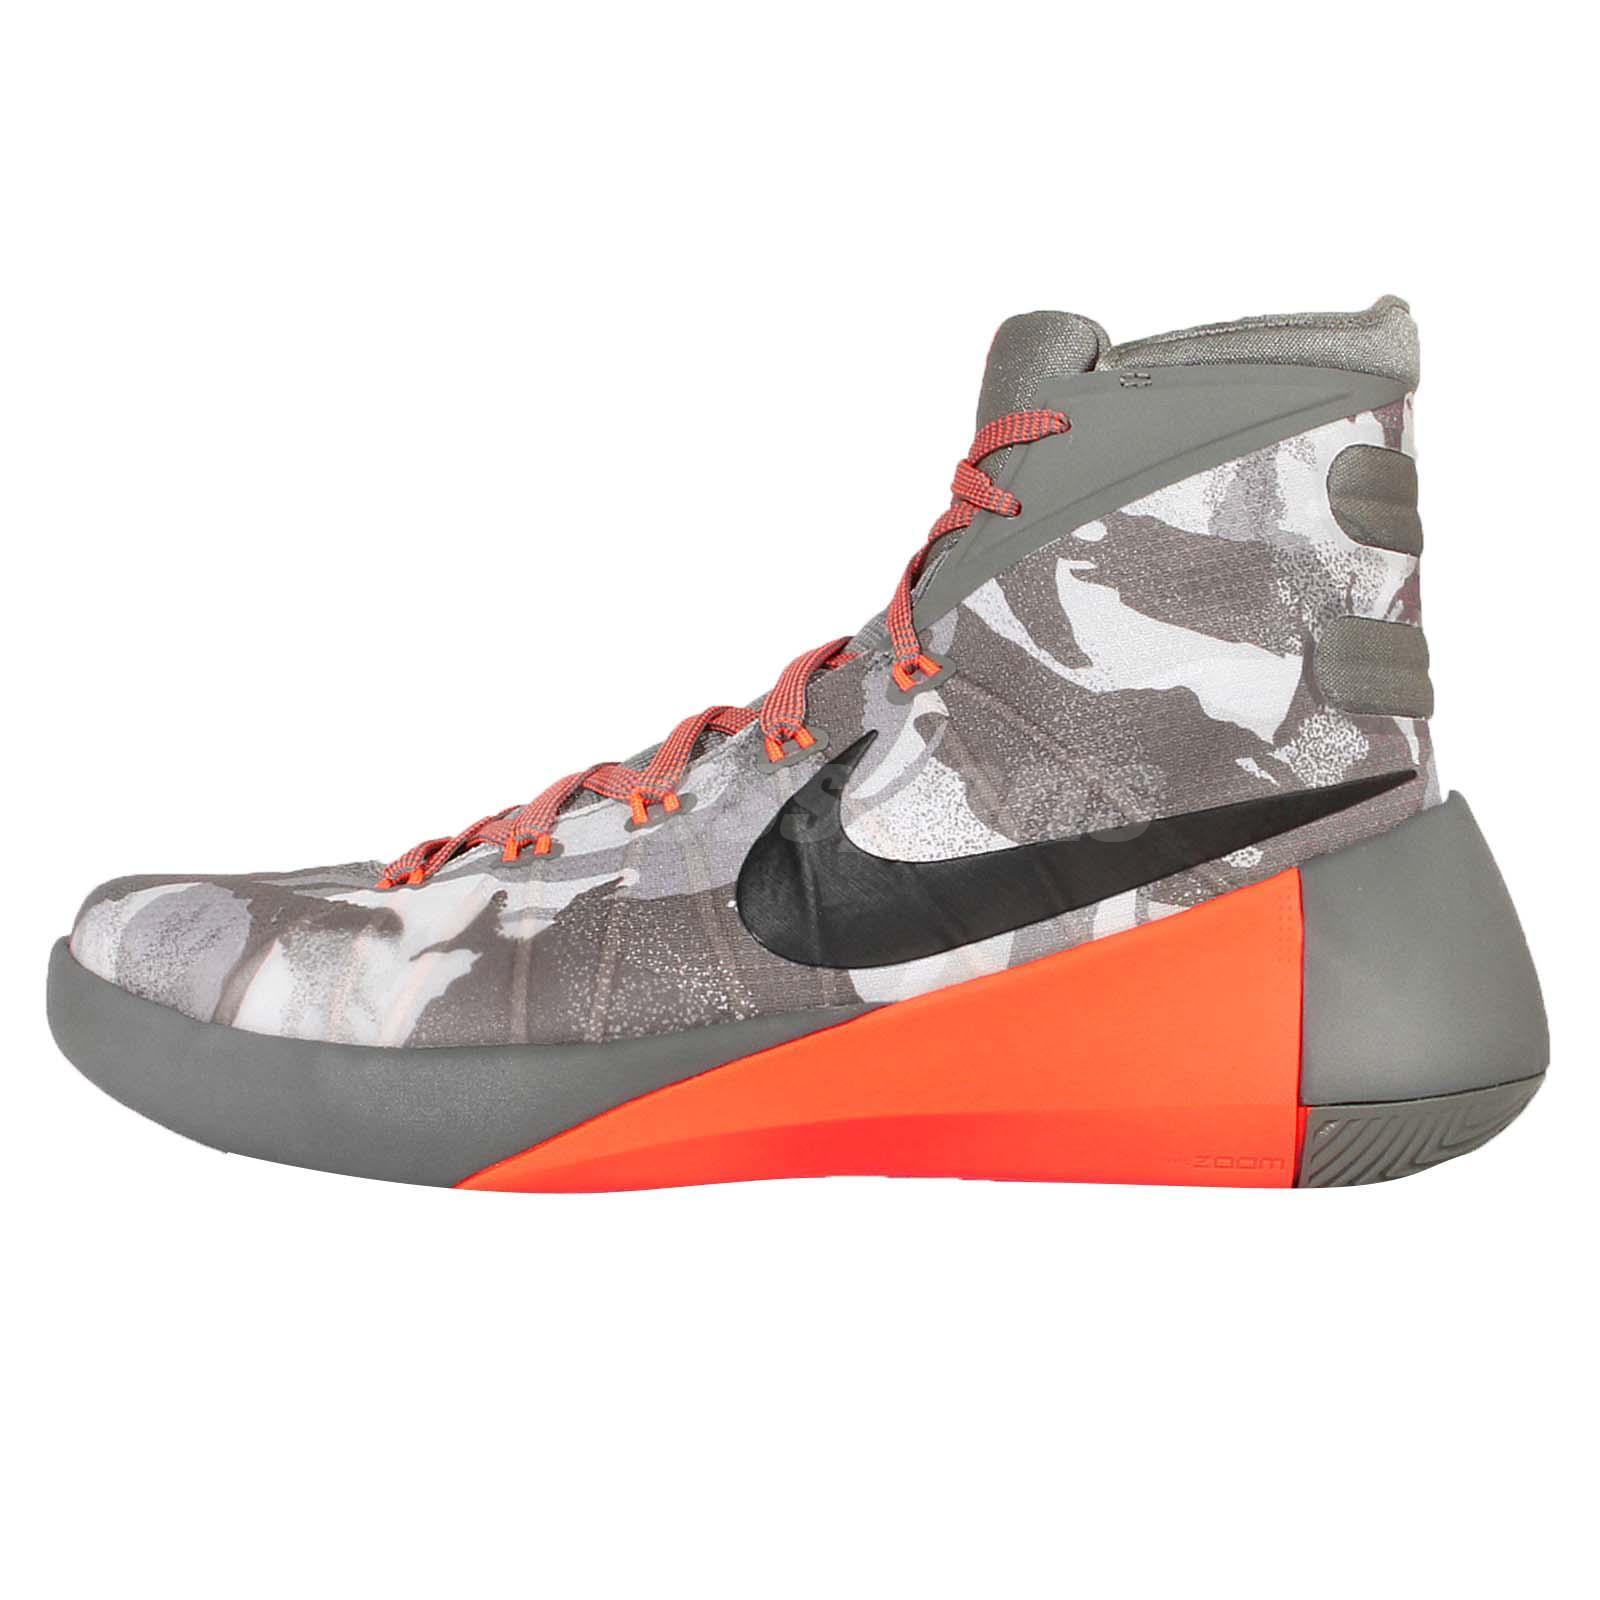 46180421c954 ... Nike Hyperdunk 2015 PRM EP Grey Orange Camo Mens Basketball Shoes  749570-001 ...